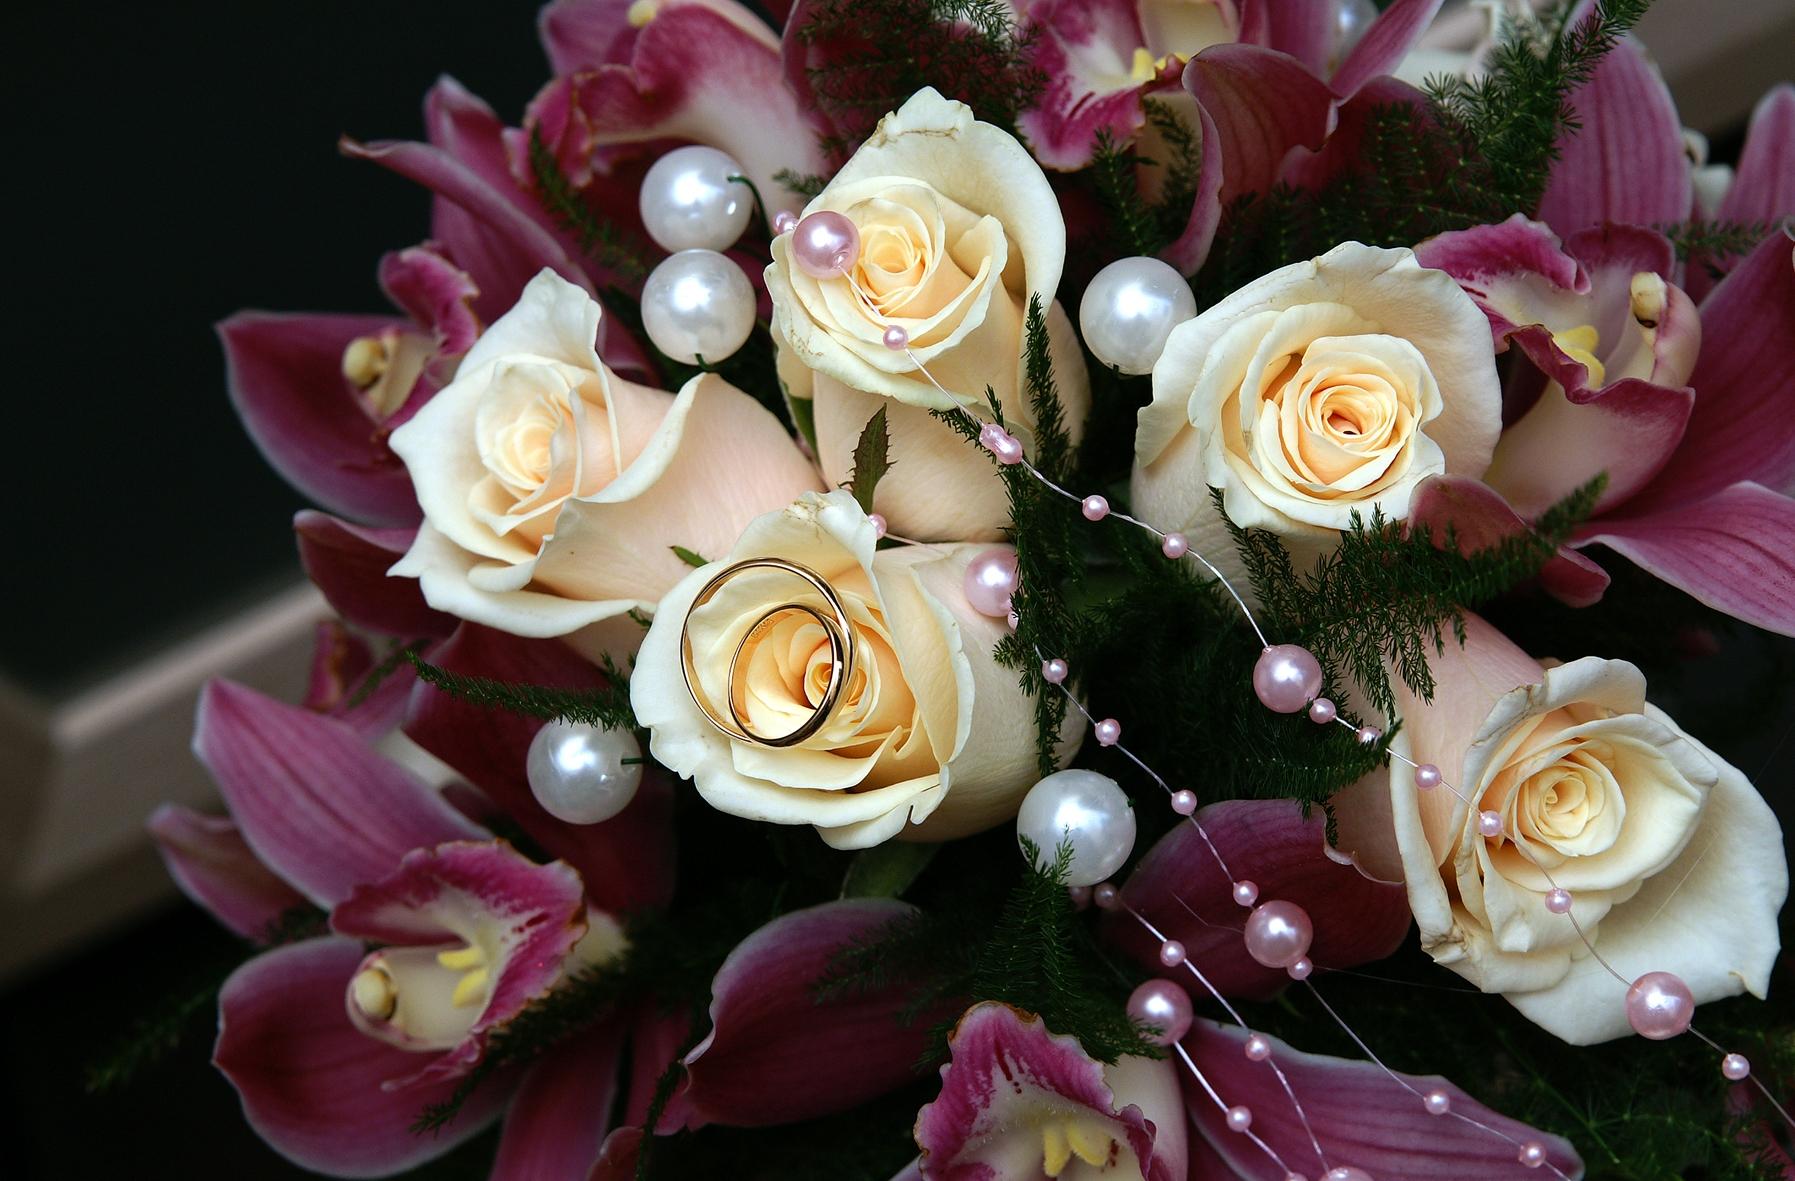 Wallpaper Purple Rose Joy Beads Blossom Pink Happiness Lilies Flora Wedding Ring Petal Retail Land Plant Flowering Floristry